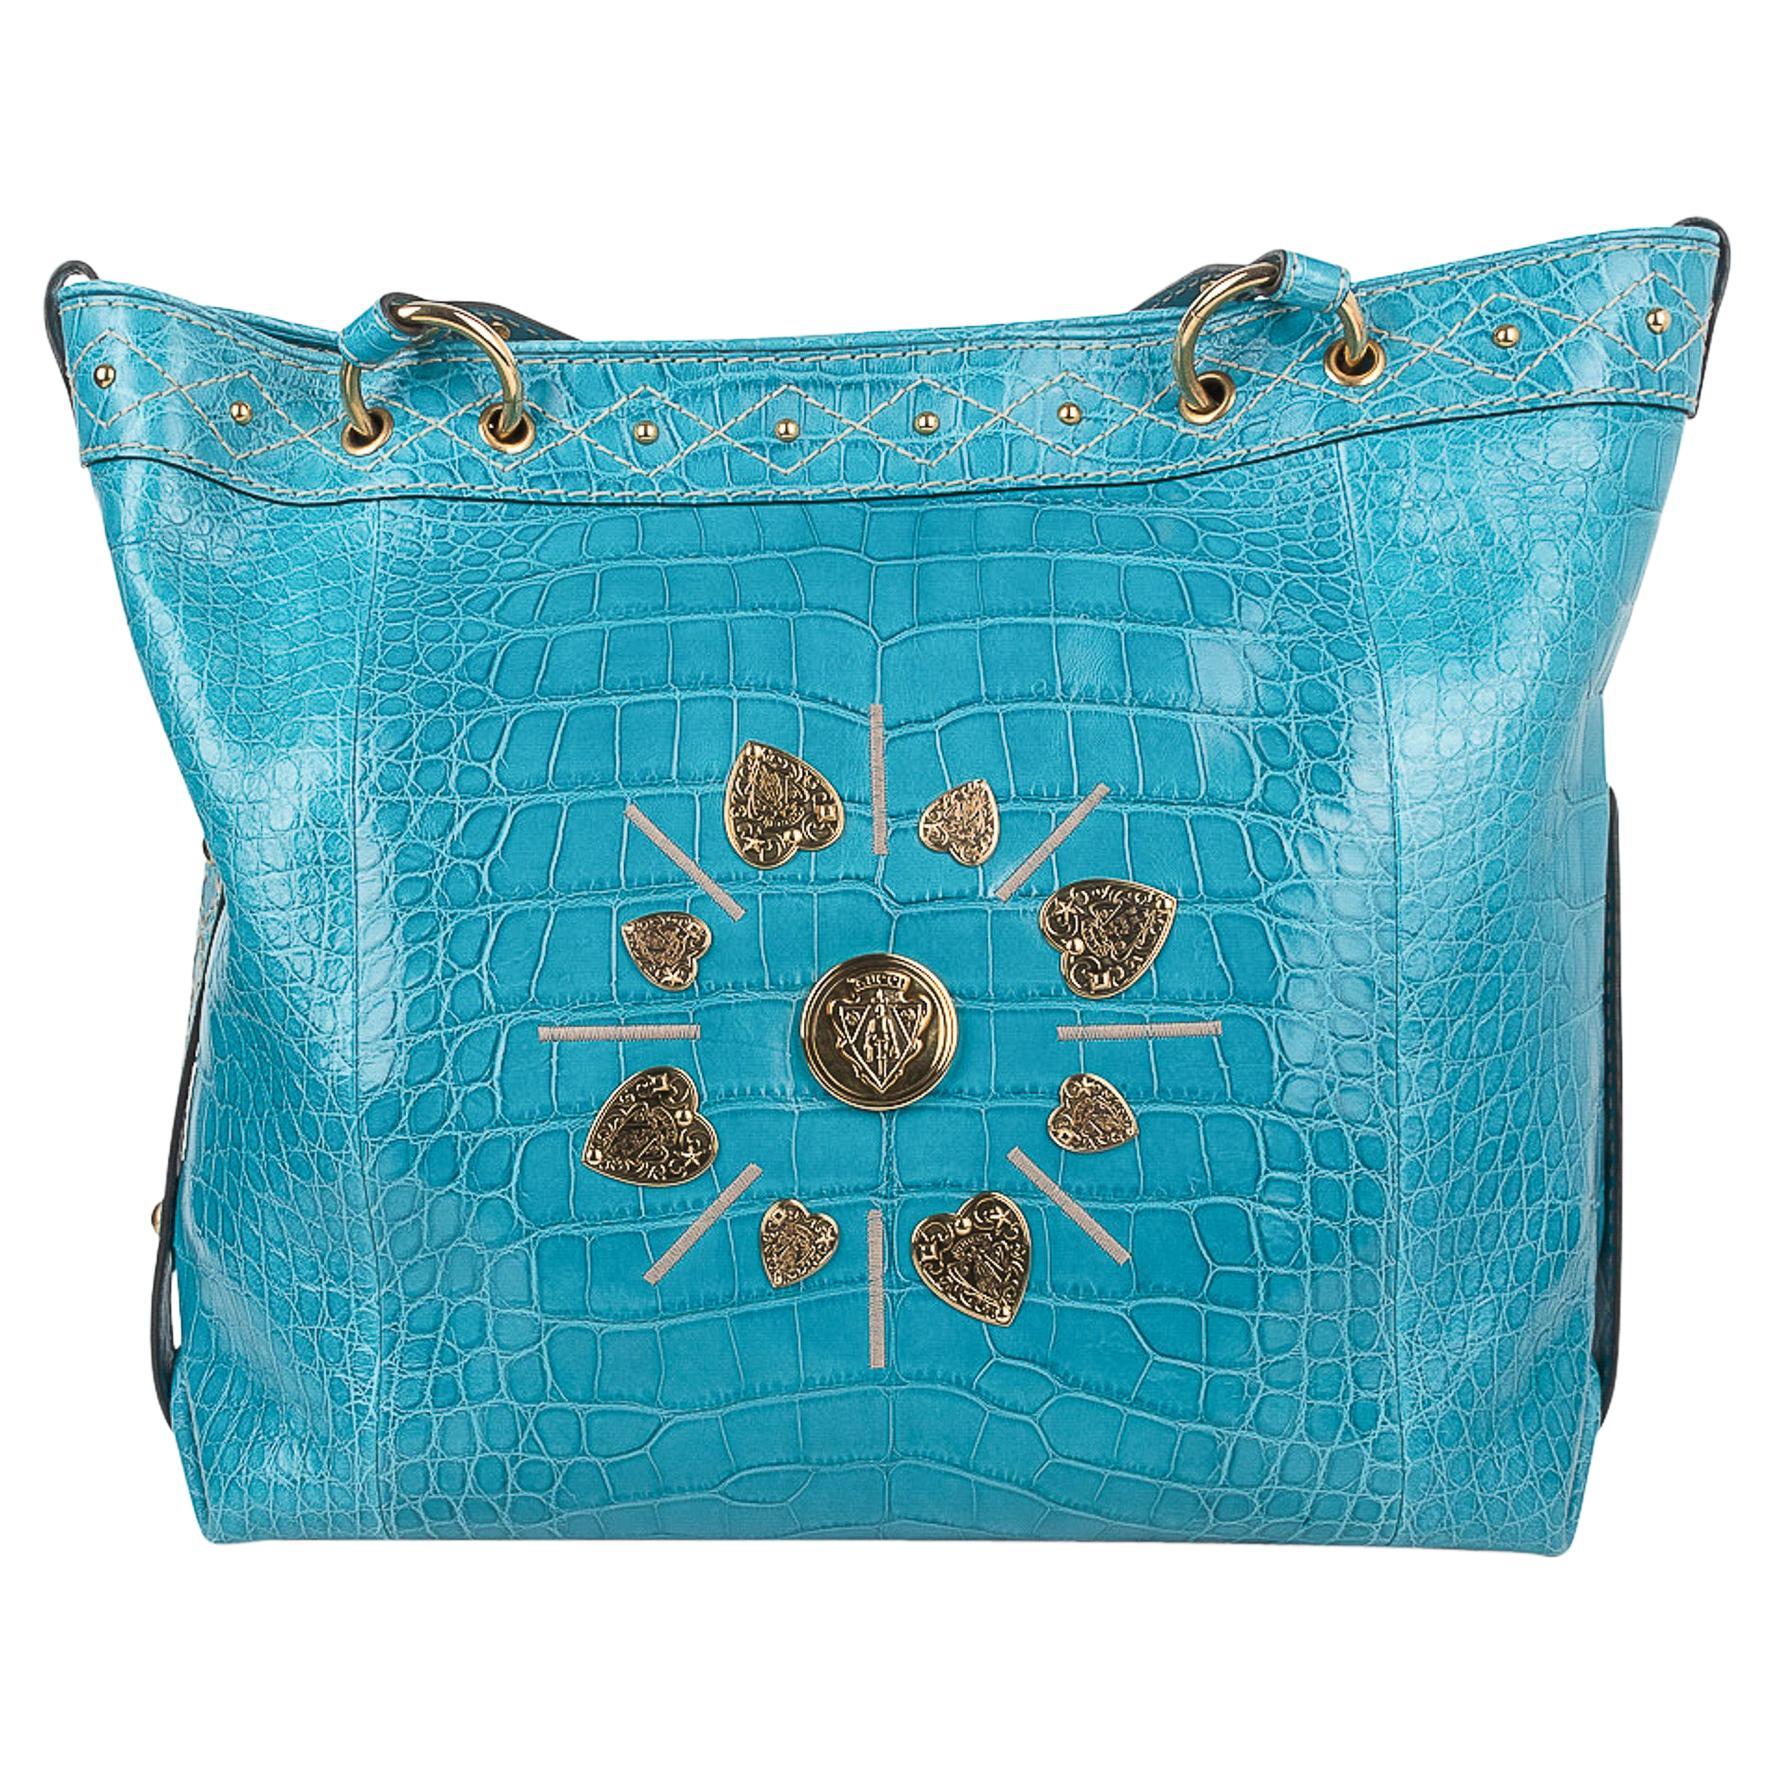 Gucci Exclusive Limited Edition Turquoise Crocodile Irina Tote Bag New